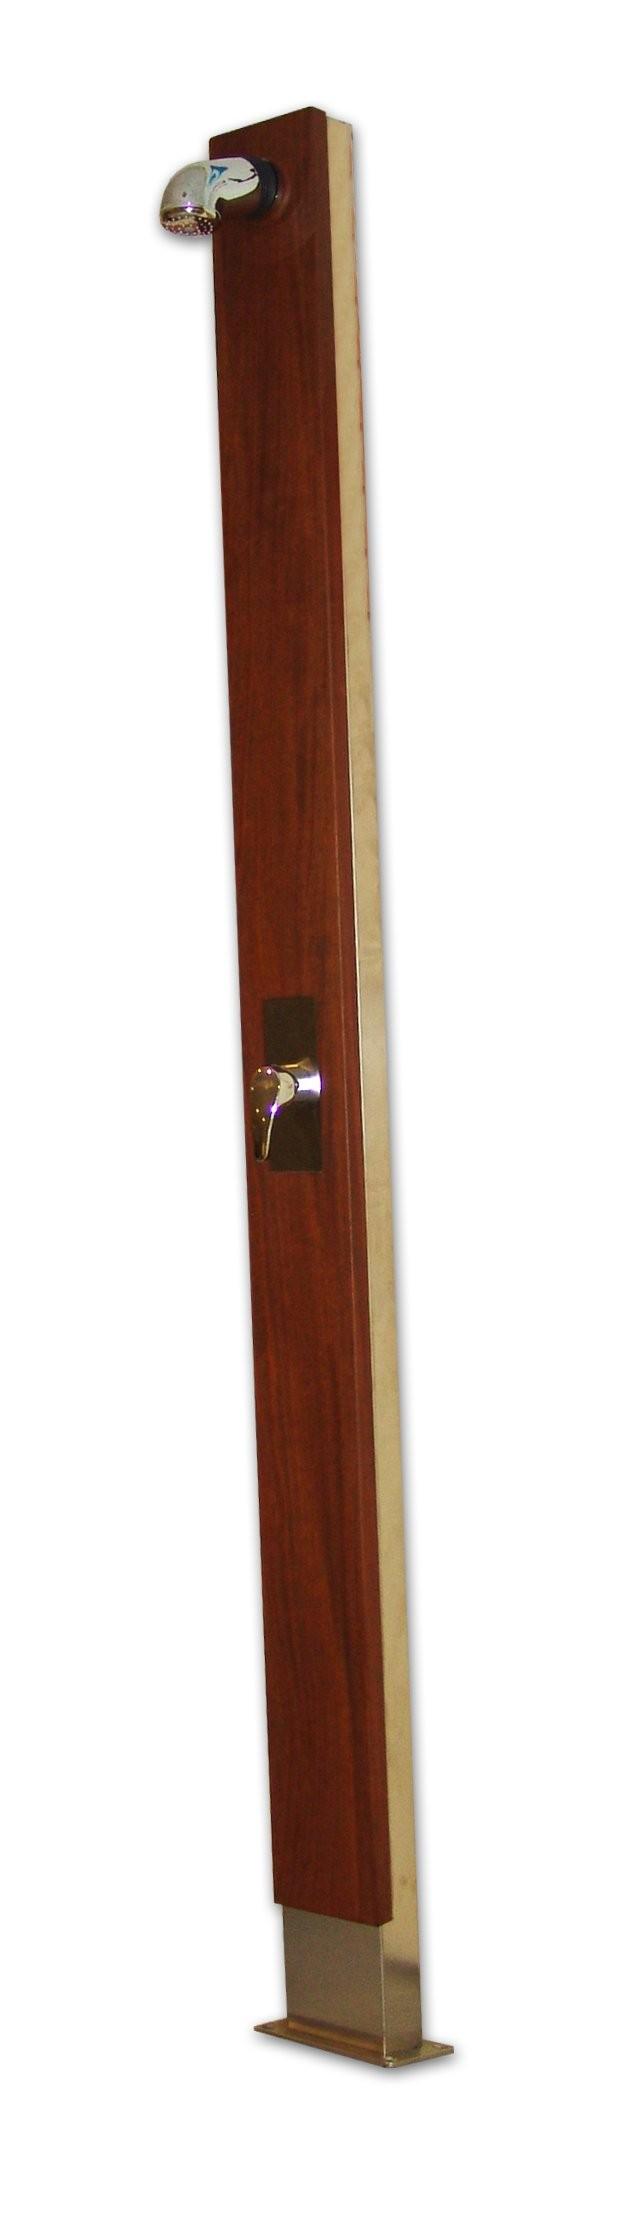 Ducha dise o de madera inox certikin piscinas ferromar - Duchas de madera ...